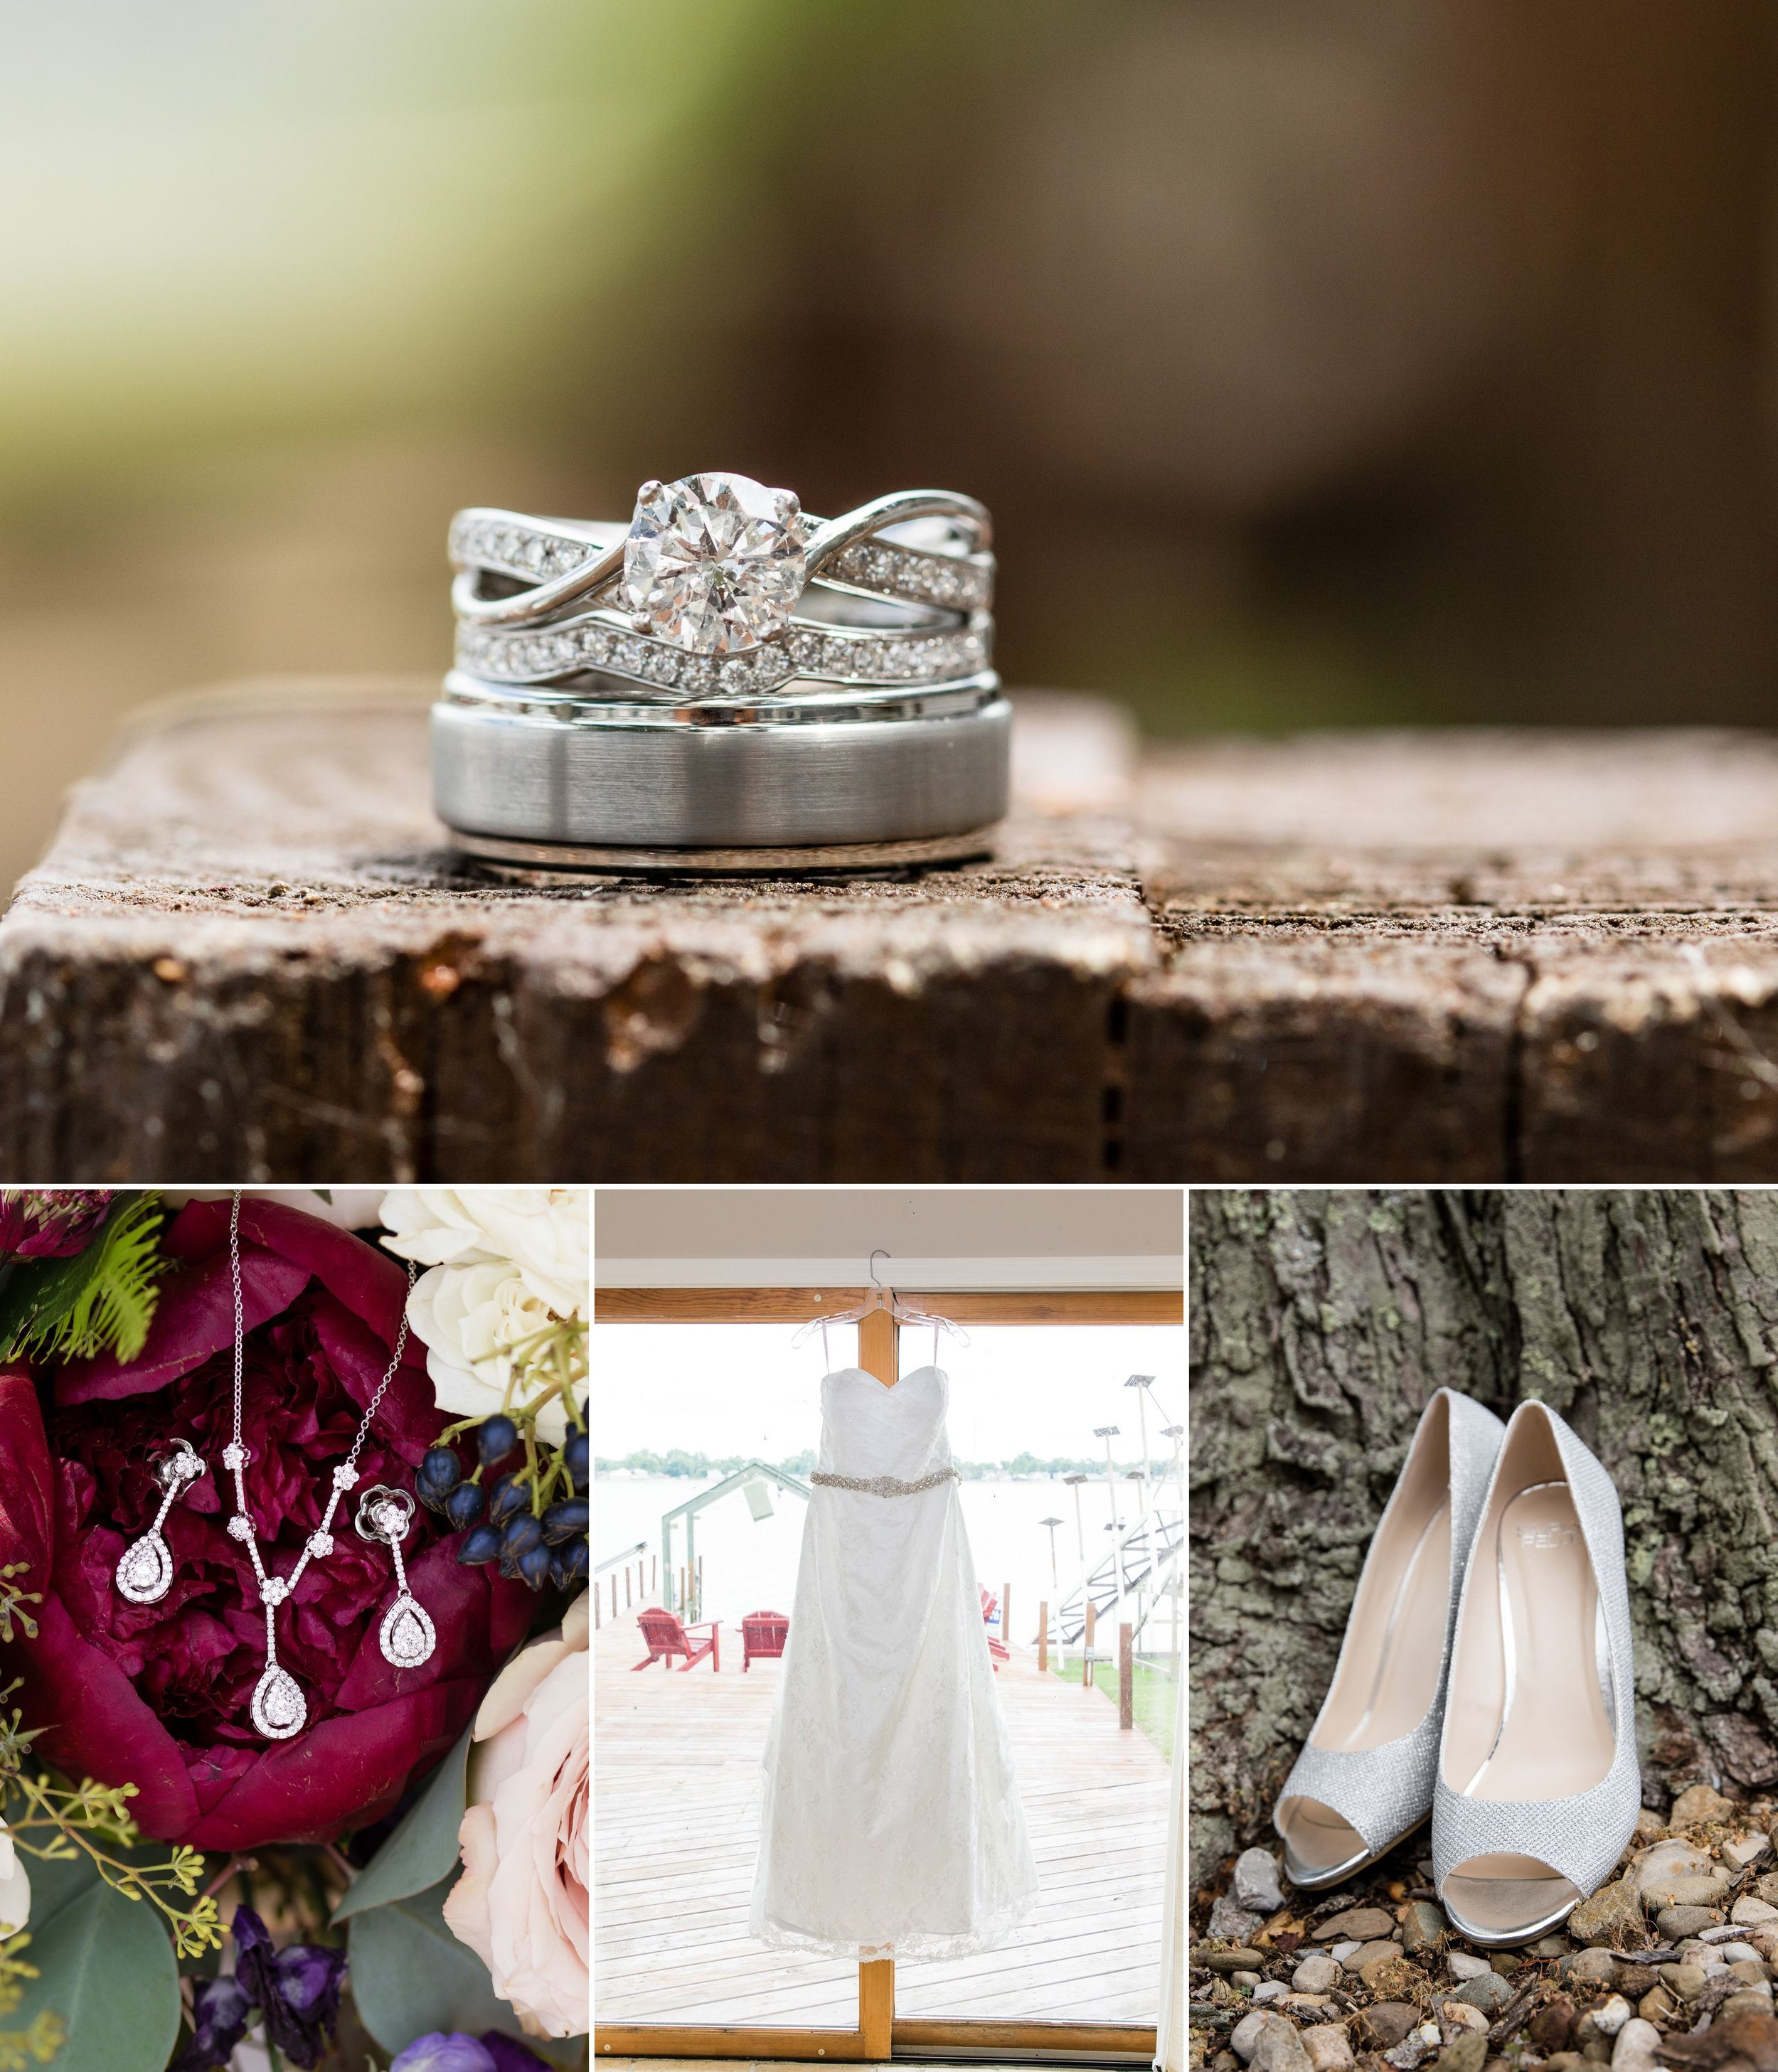 001-Buckeye-lake-winery-wedding-getting-ready-details-ring-shot-columbus-ohio-wedding-photography-muschlitz-photography-01.JPG